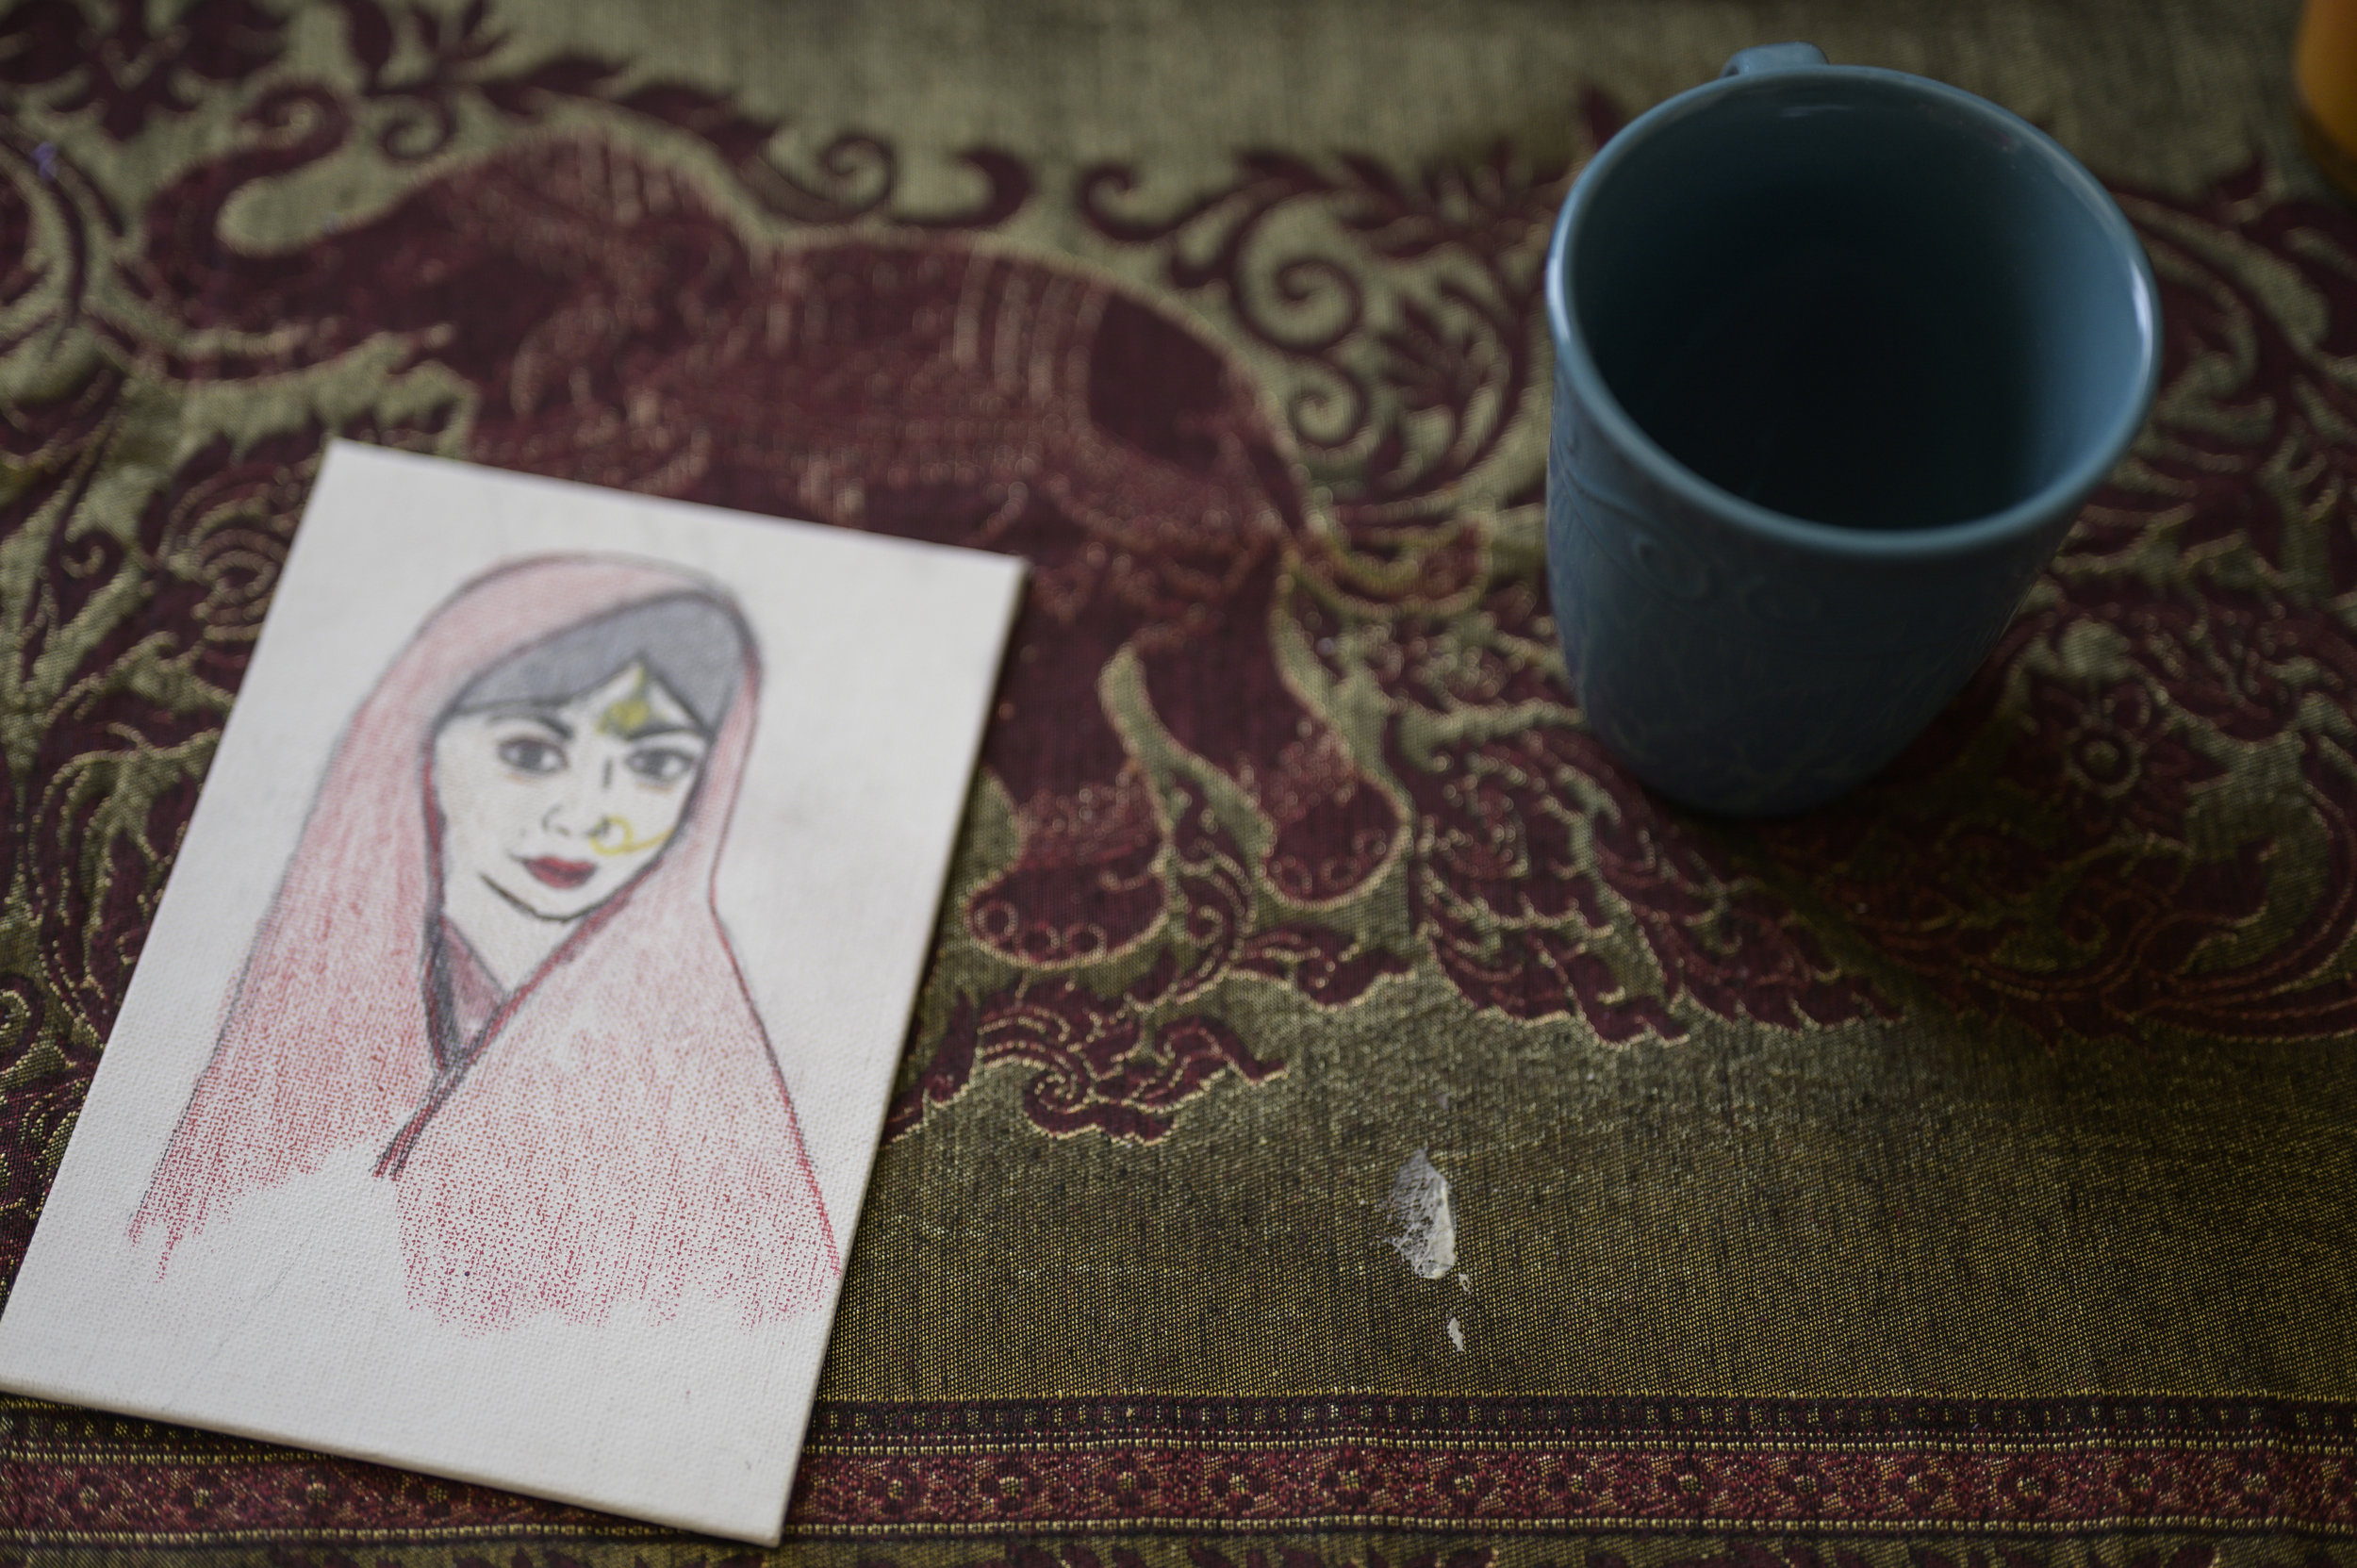 fabric-painting-artogether-women-6.jpg